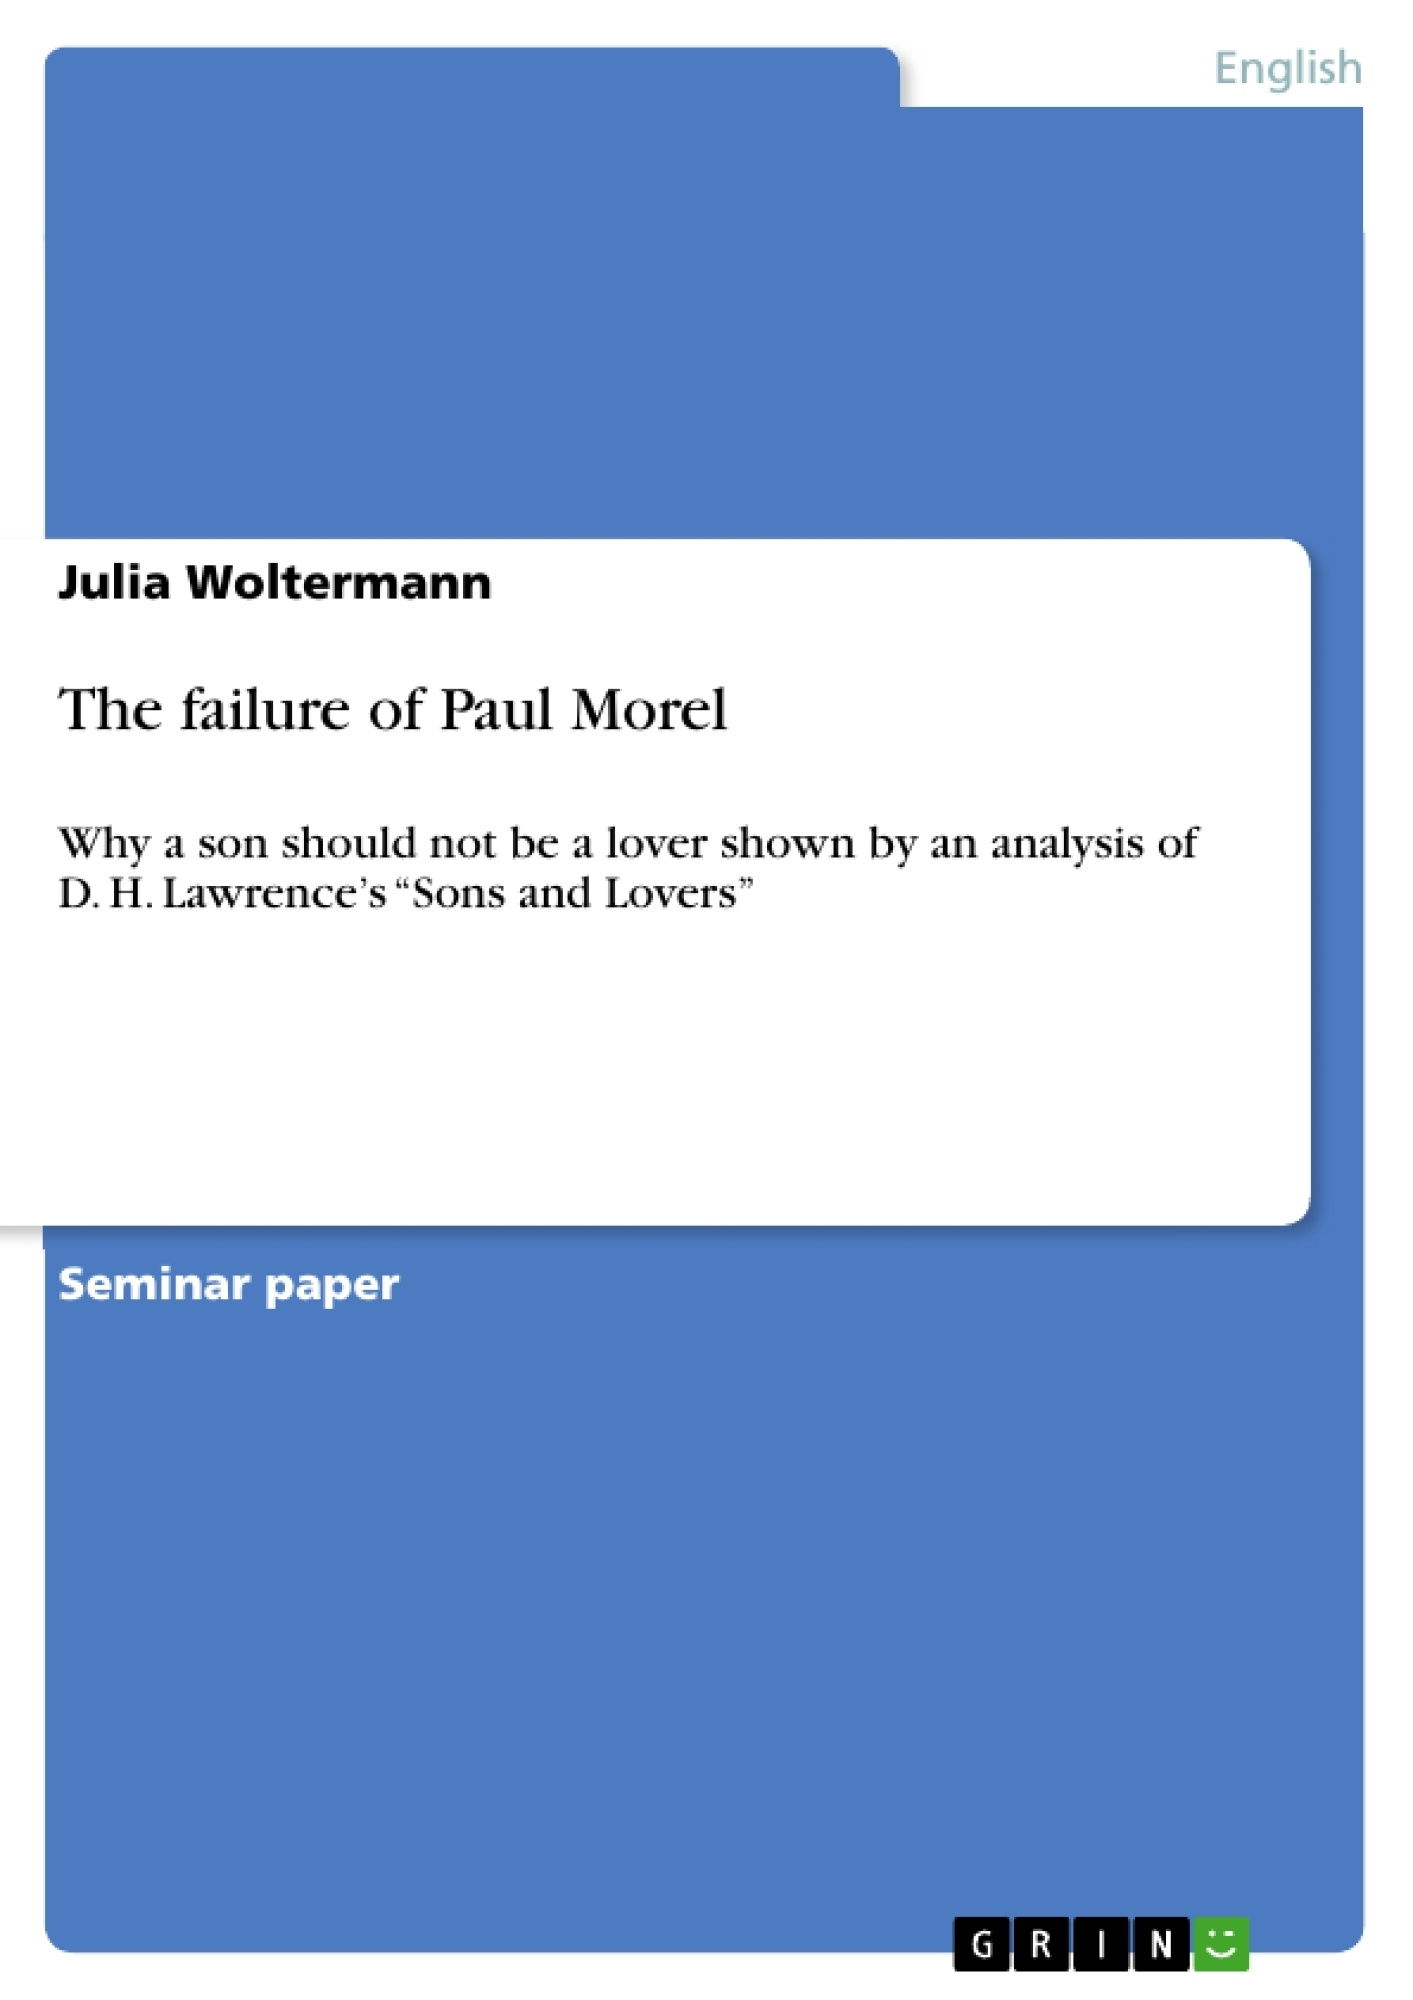 Title: The failure of Paul Morel